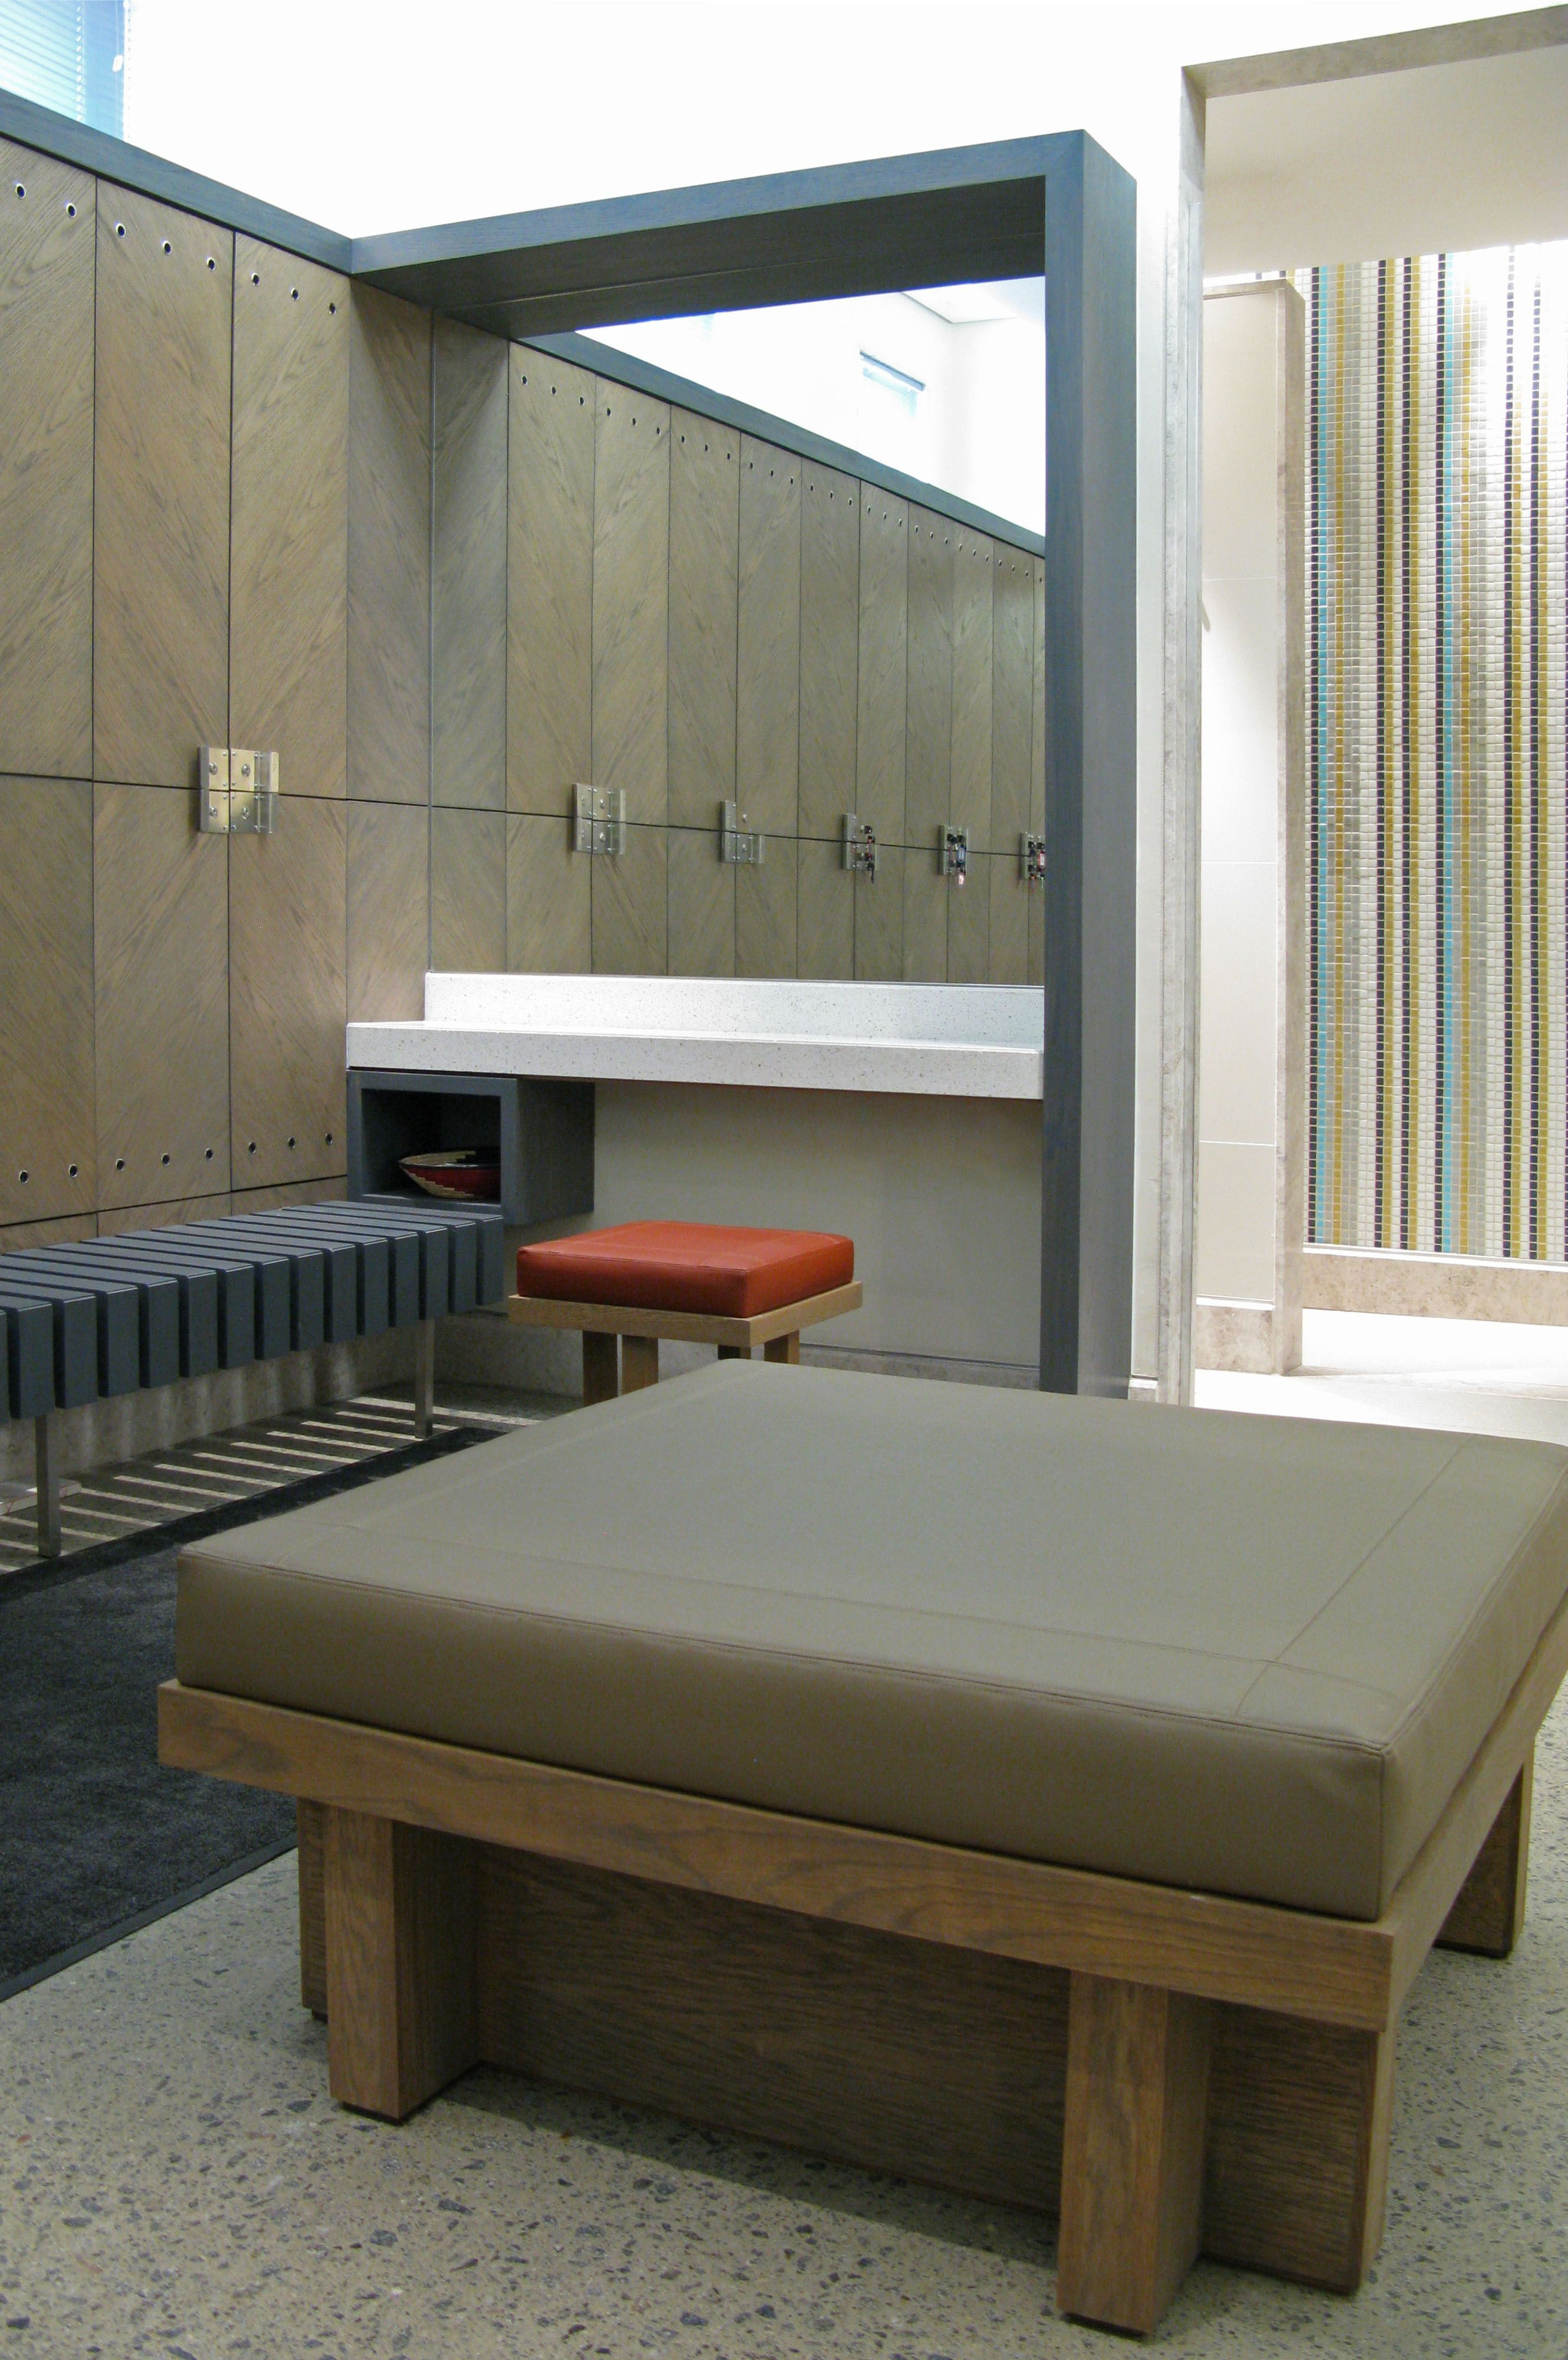 K M2k Architecture And Interior Design Copperleaf Golf Club Centurion South Africa Ladies Changeroom Interior